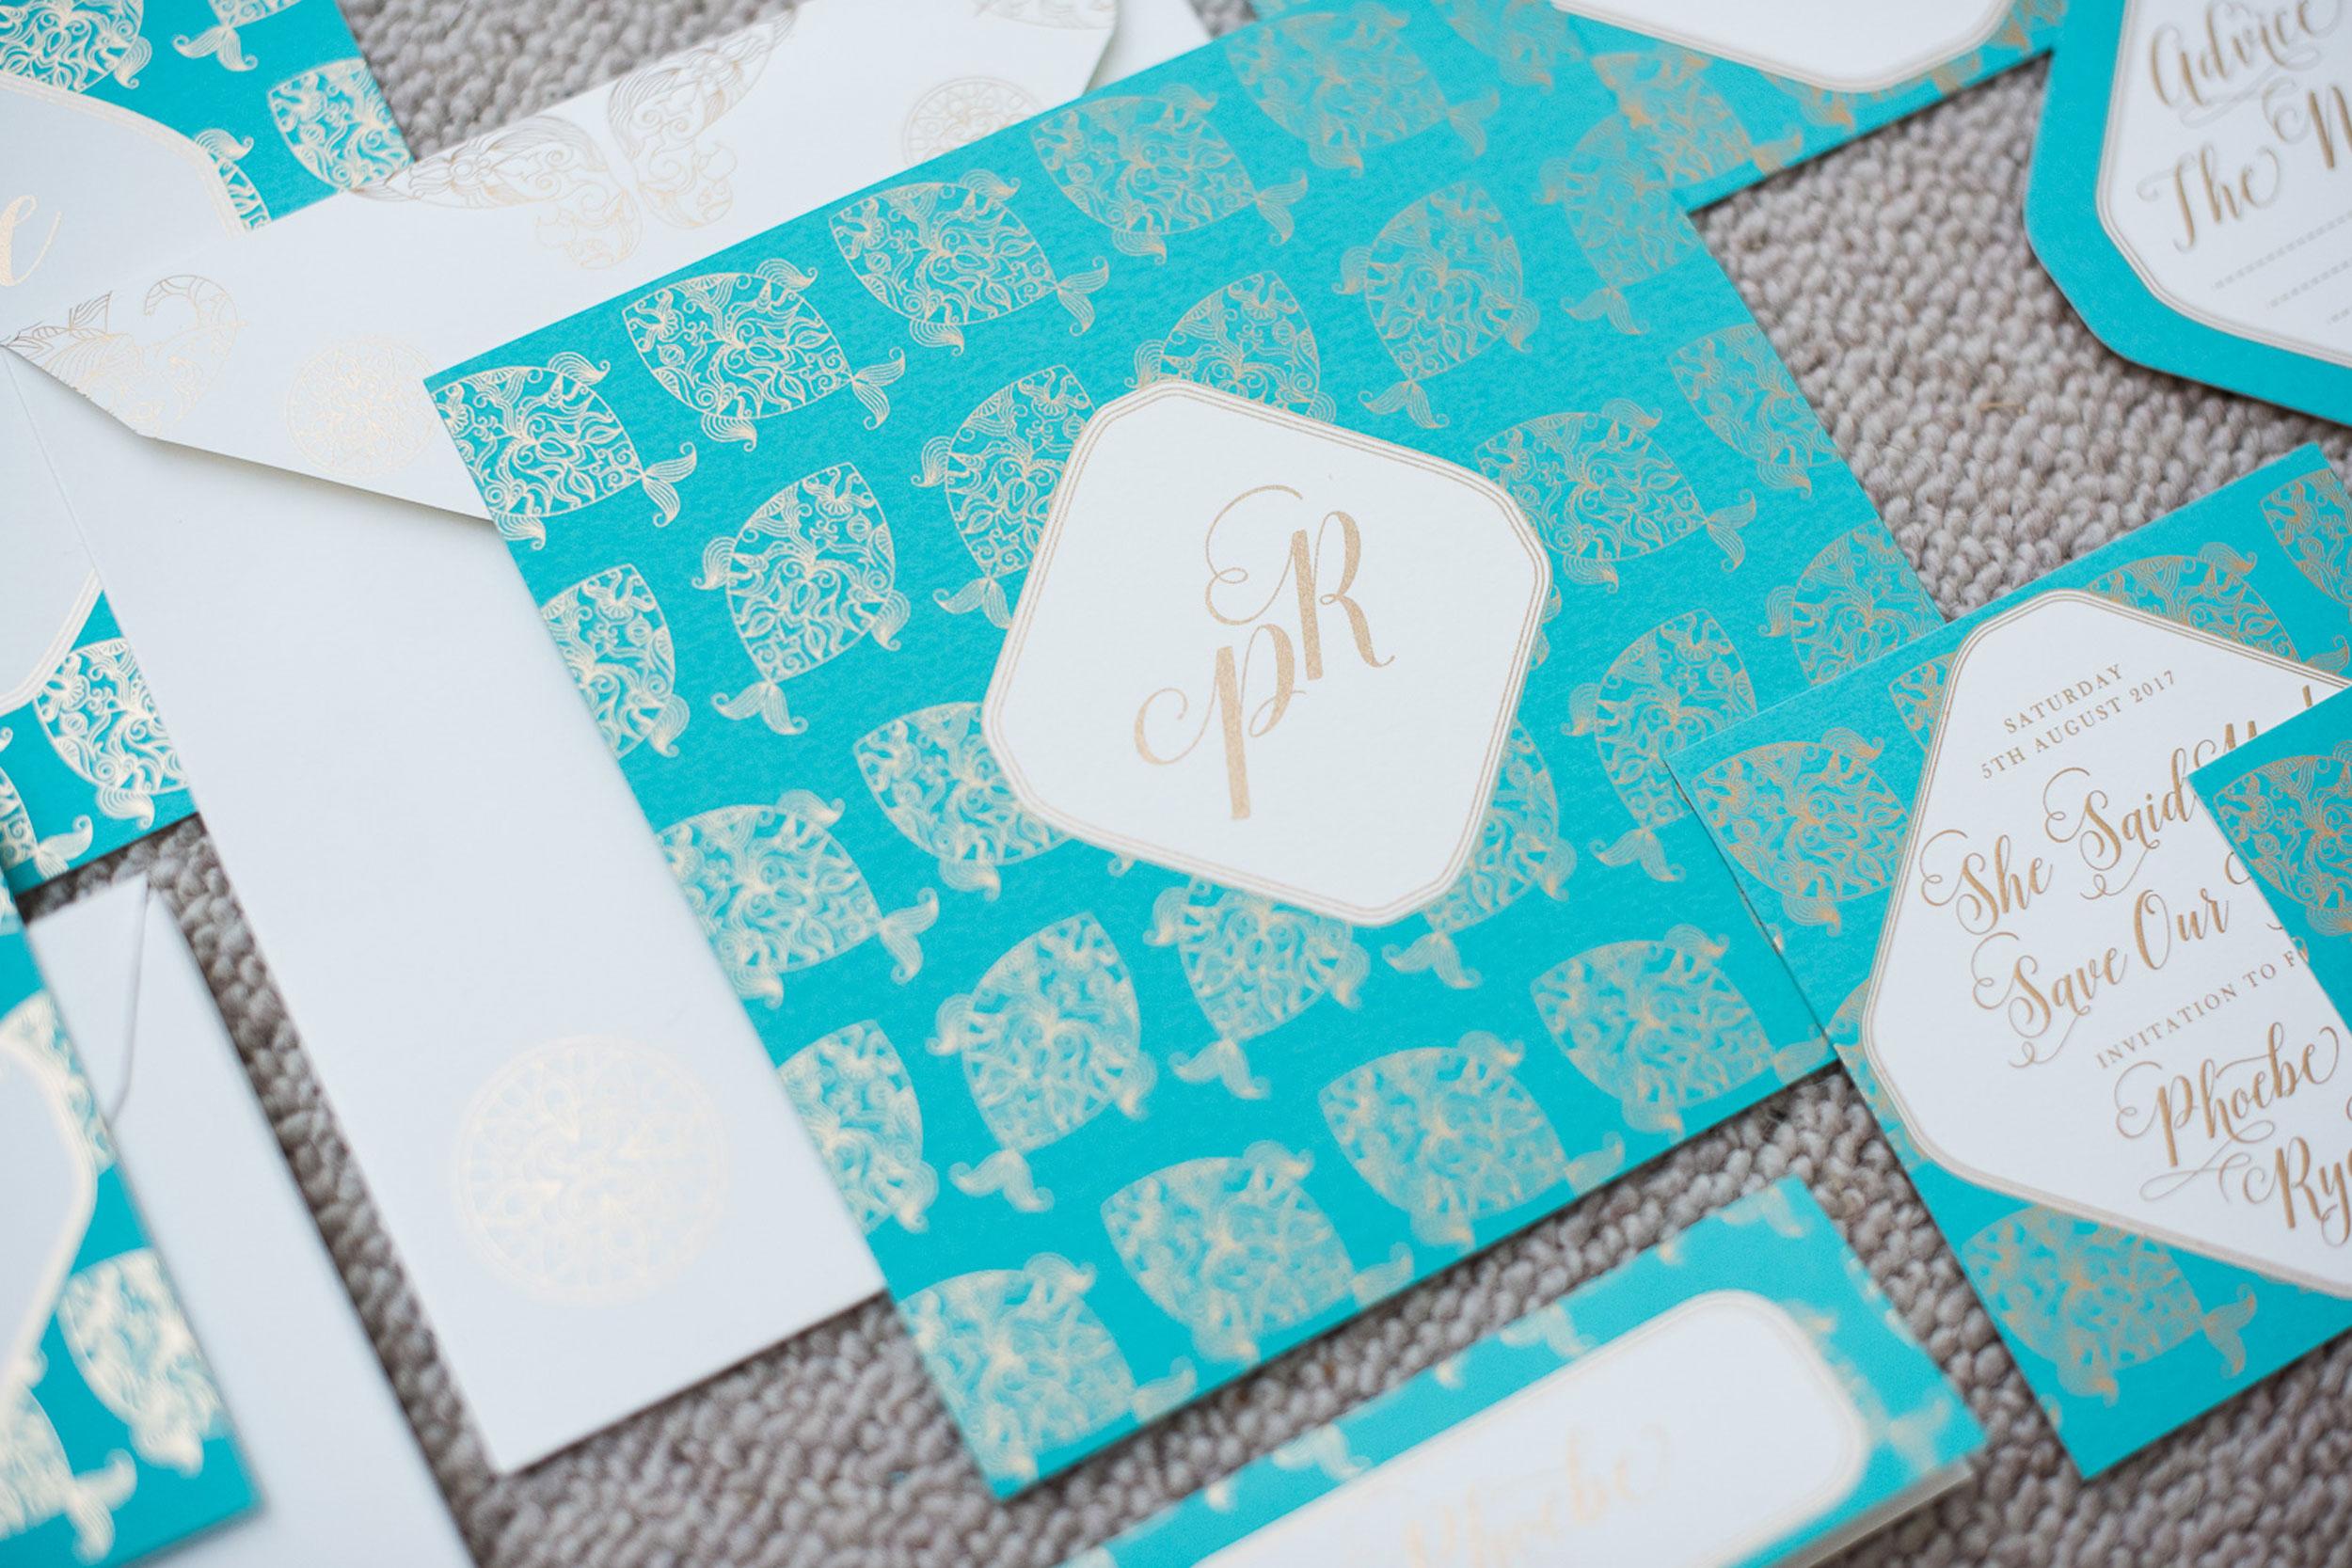 trio-of-life-blue-fish-invite-wedding-invitation.jpg